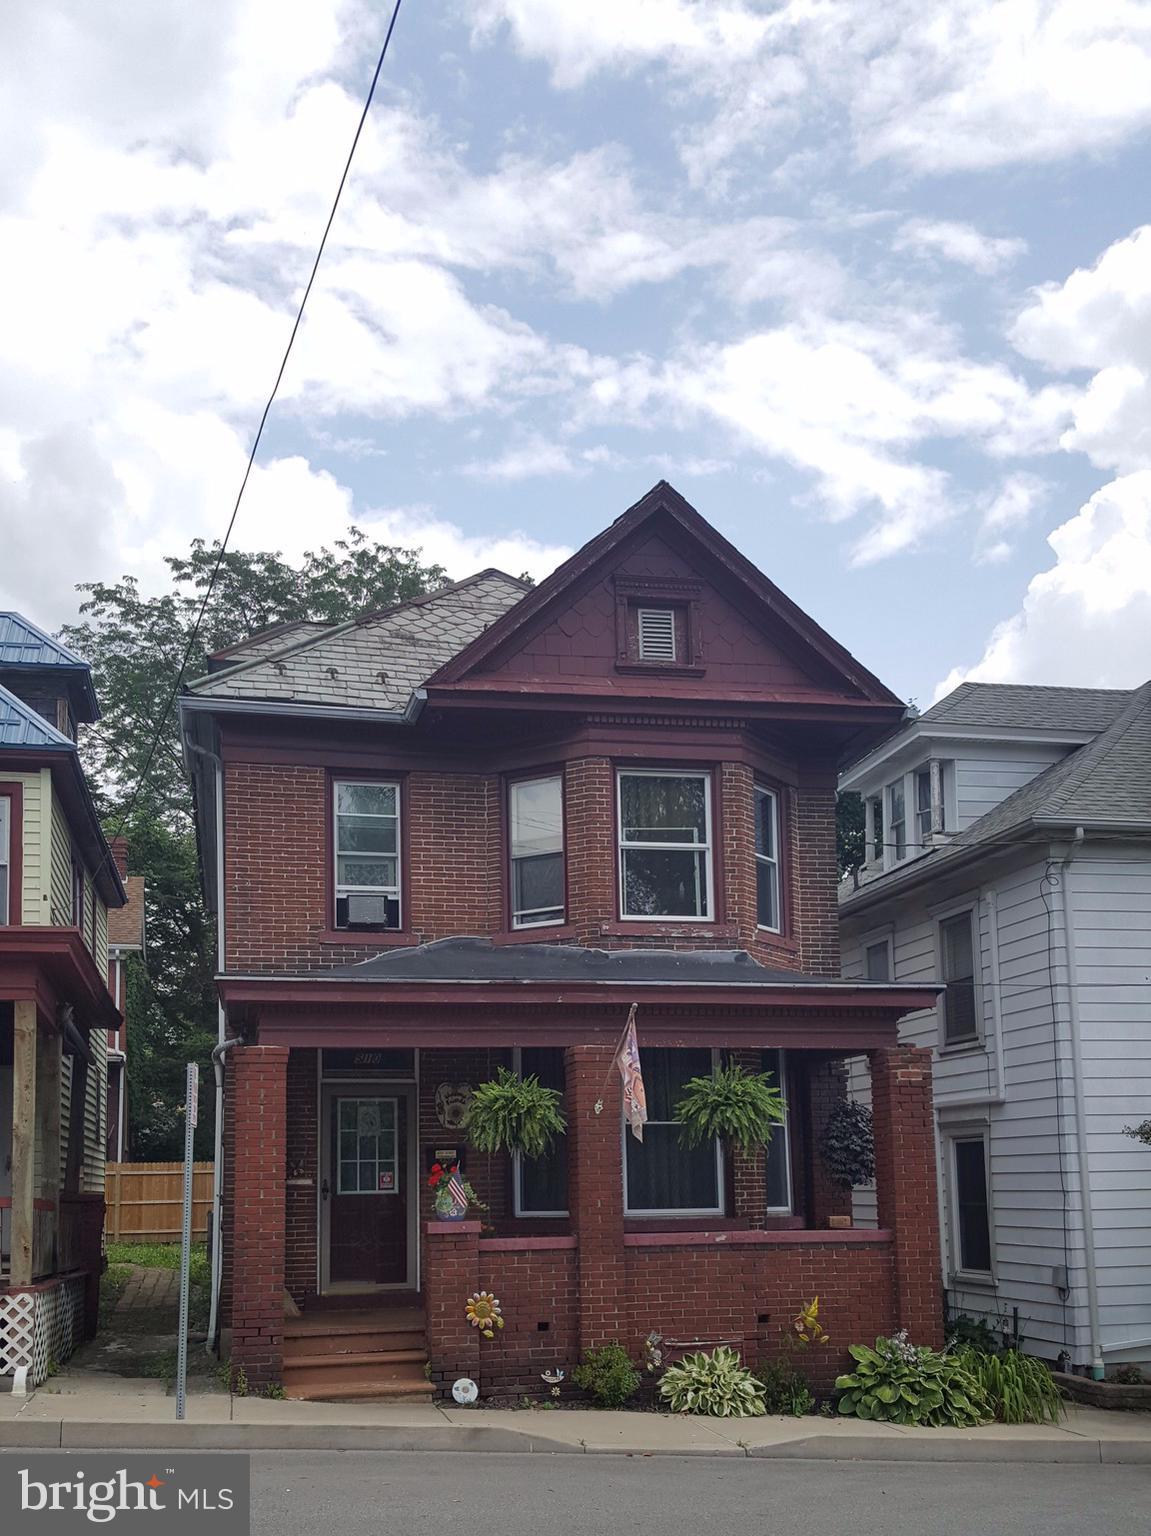 510 5TH STREET, HUNTINGDON, PA 16652